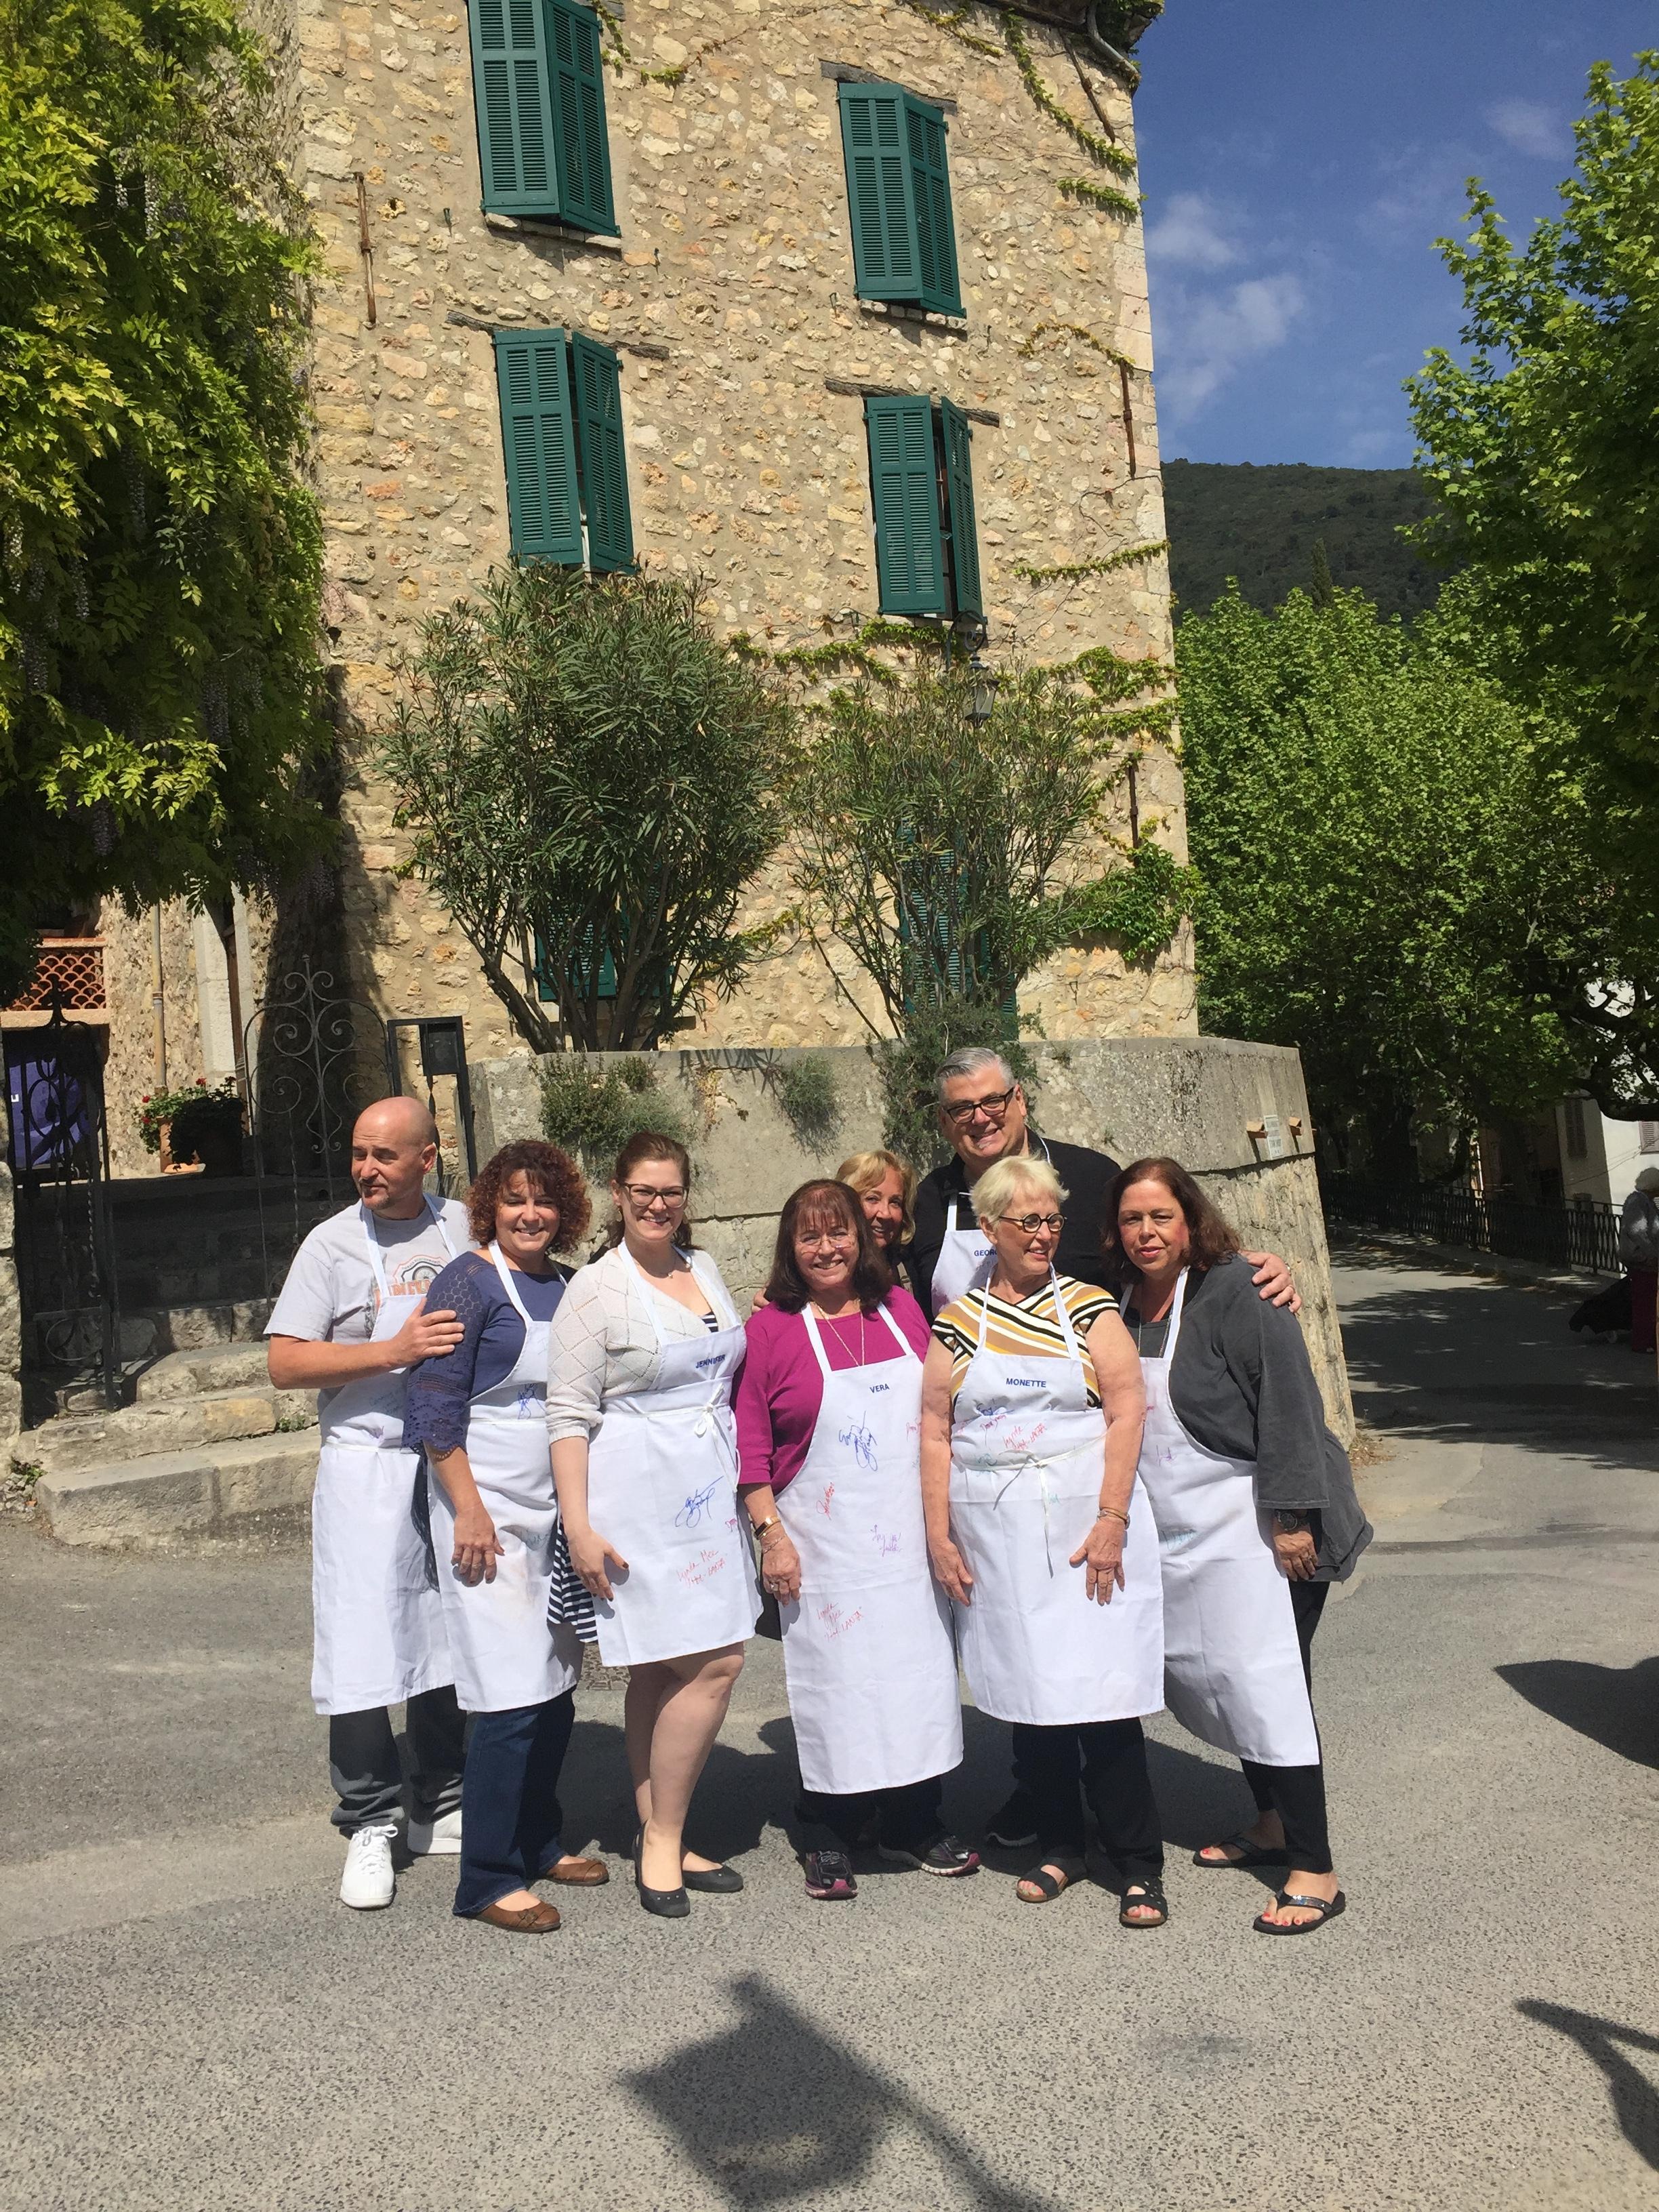 France 2019 - Our villa in Seillans France